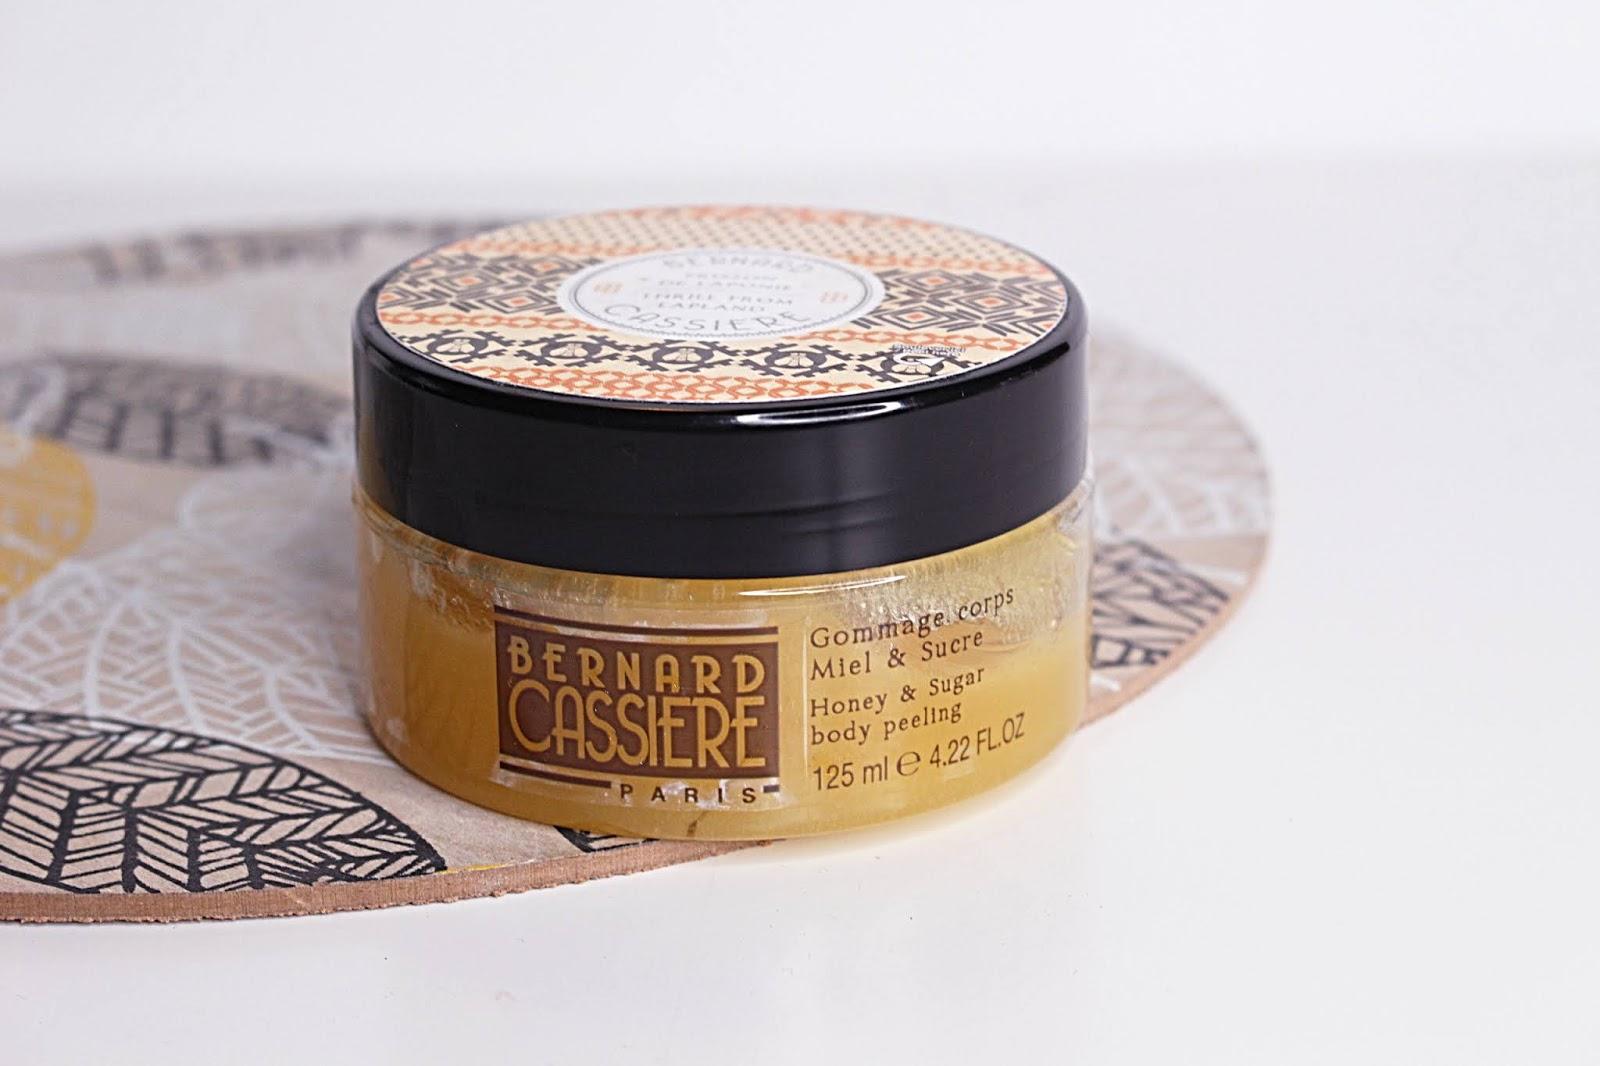 Bernard Cassière Honey & Sugar body peeling